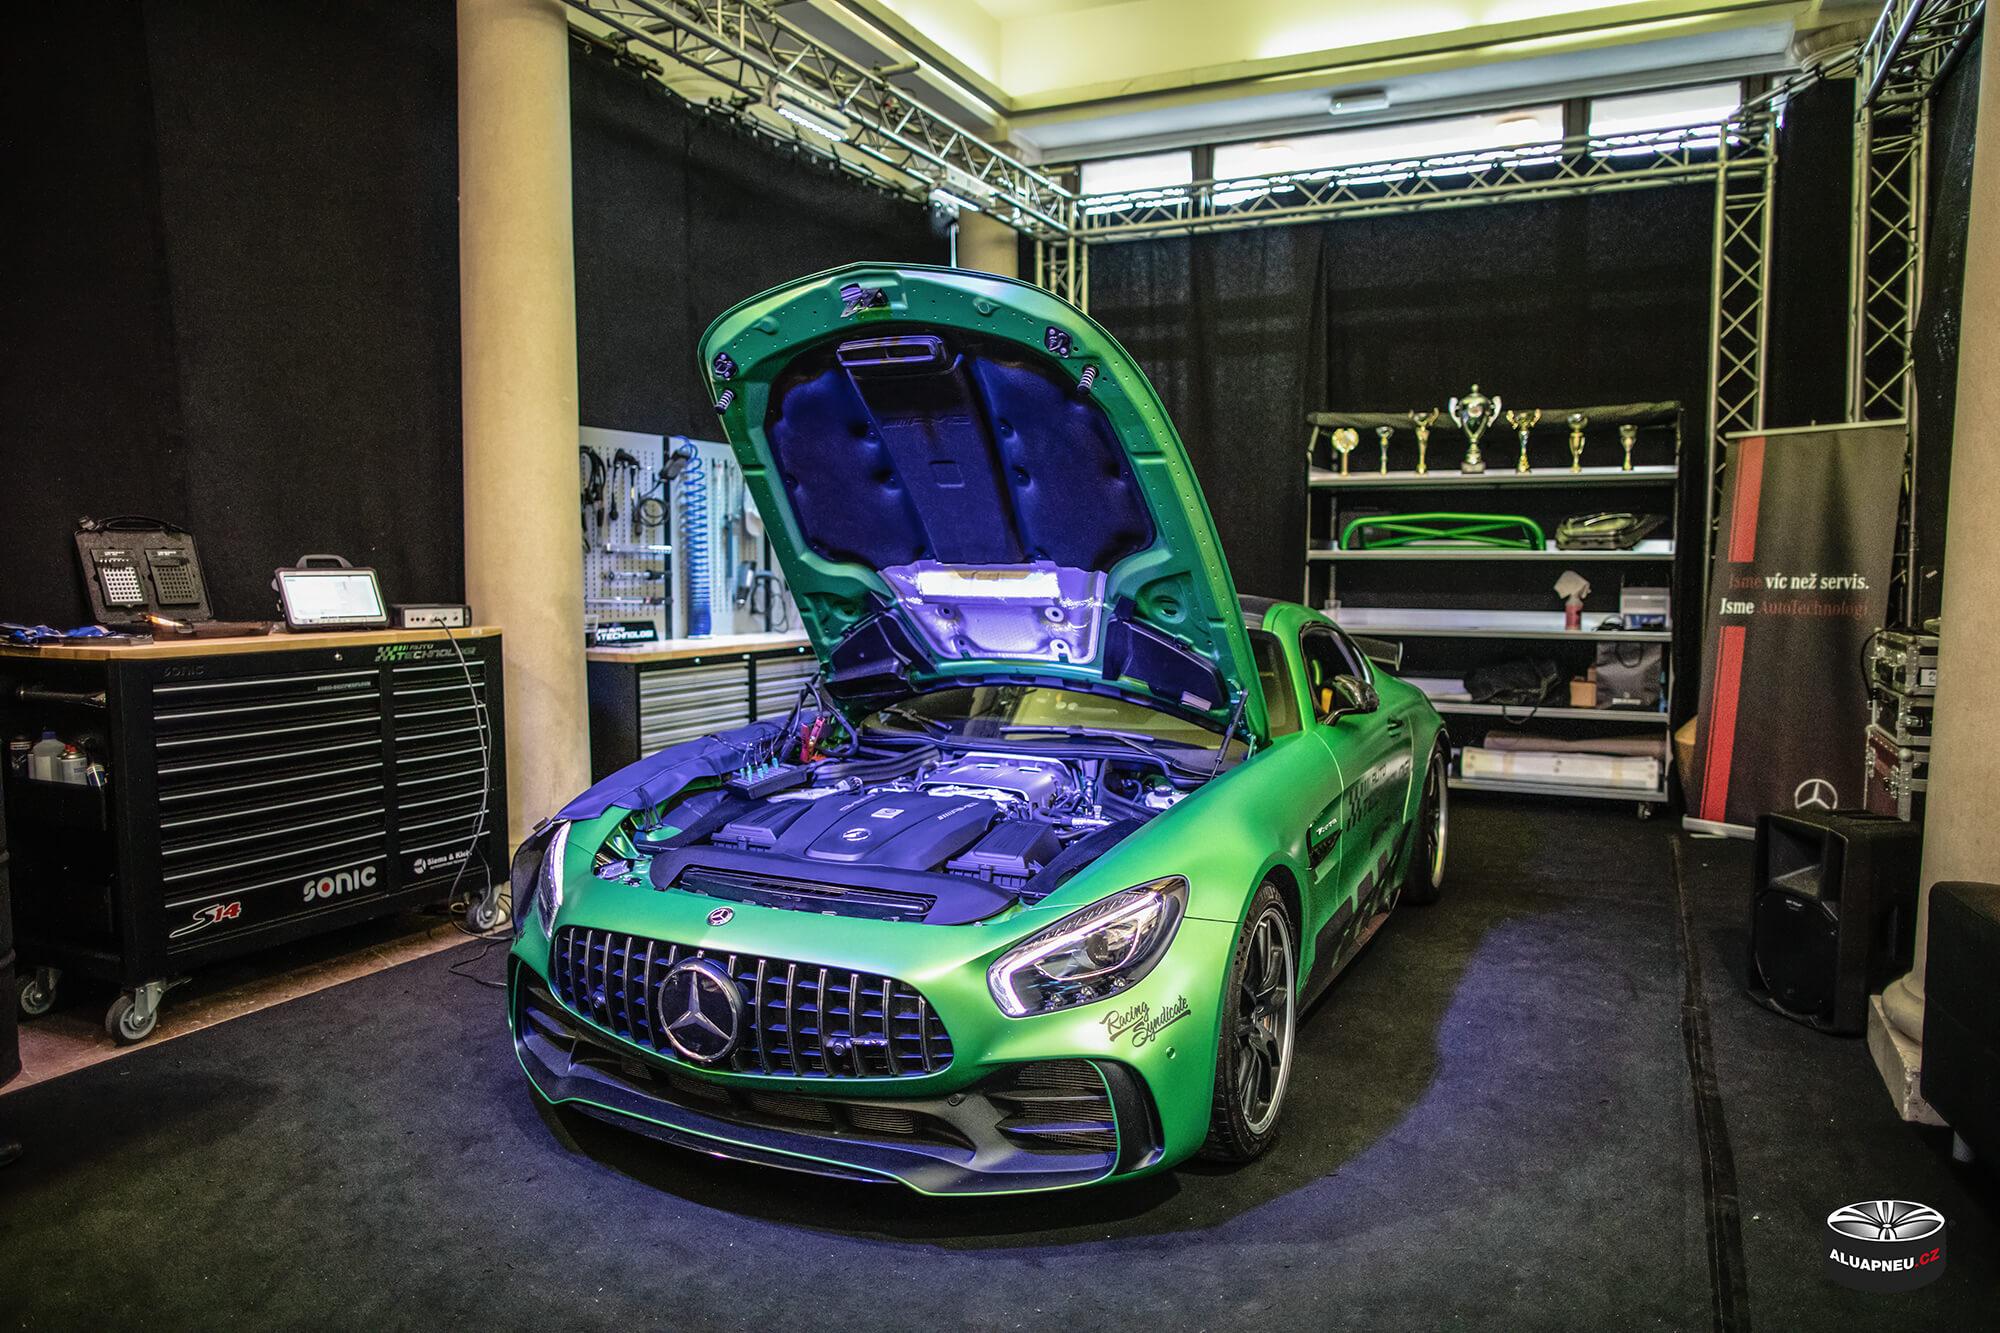 Amg Gtr Mercedes - Automobilové Legendy 2019 - www.aluapneu.cz